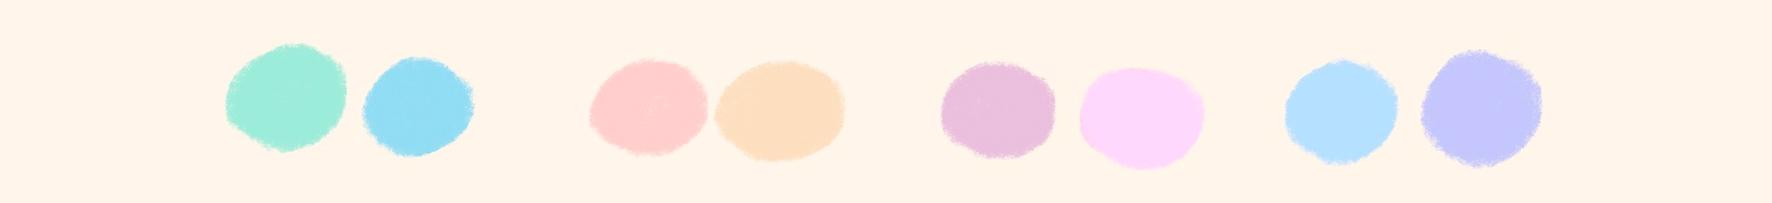 Combinación de tonos claros